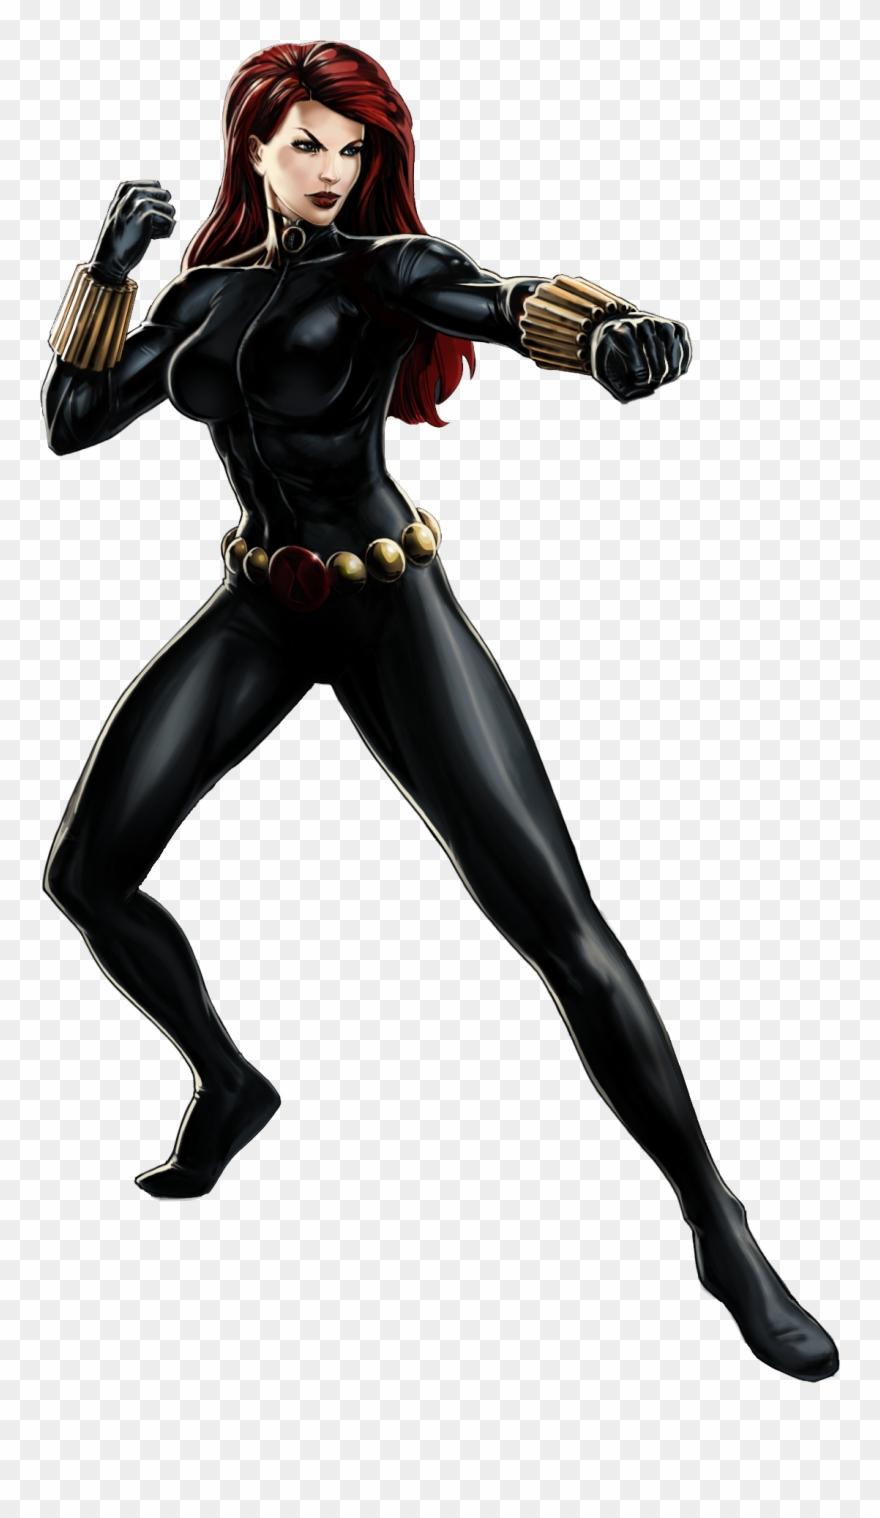 Black Widow Png Transparent Images.